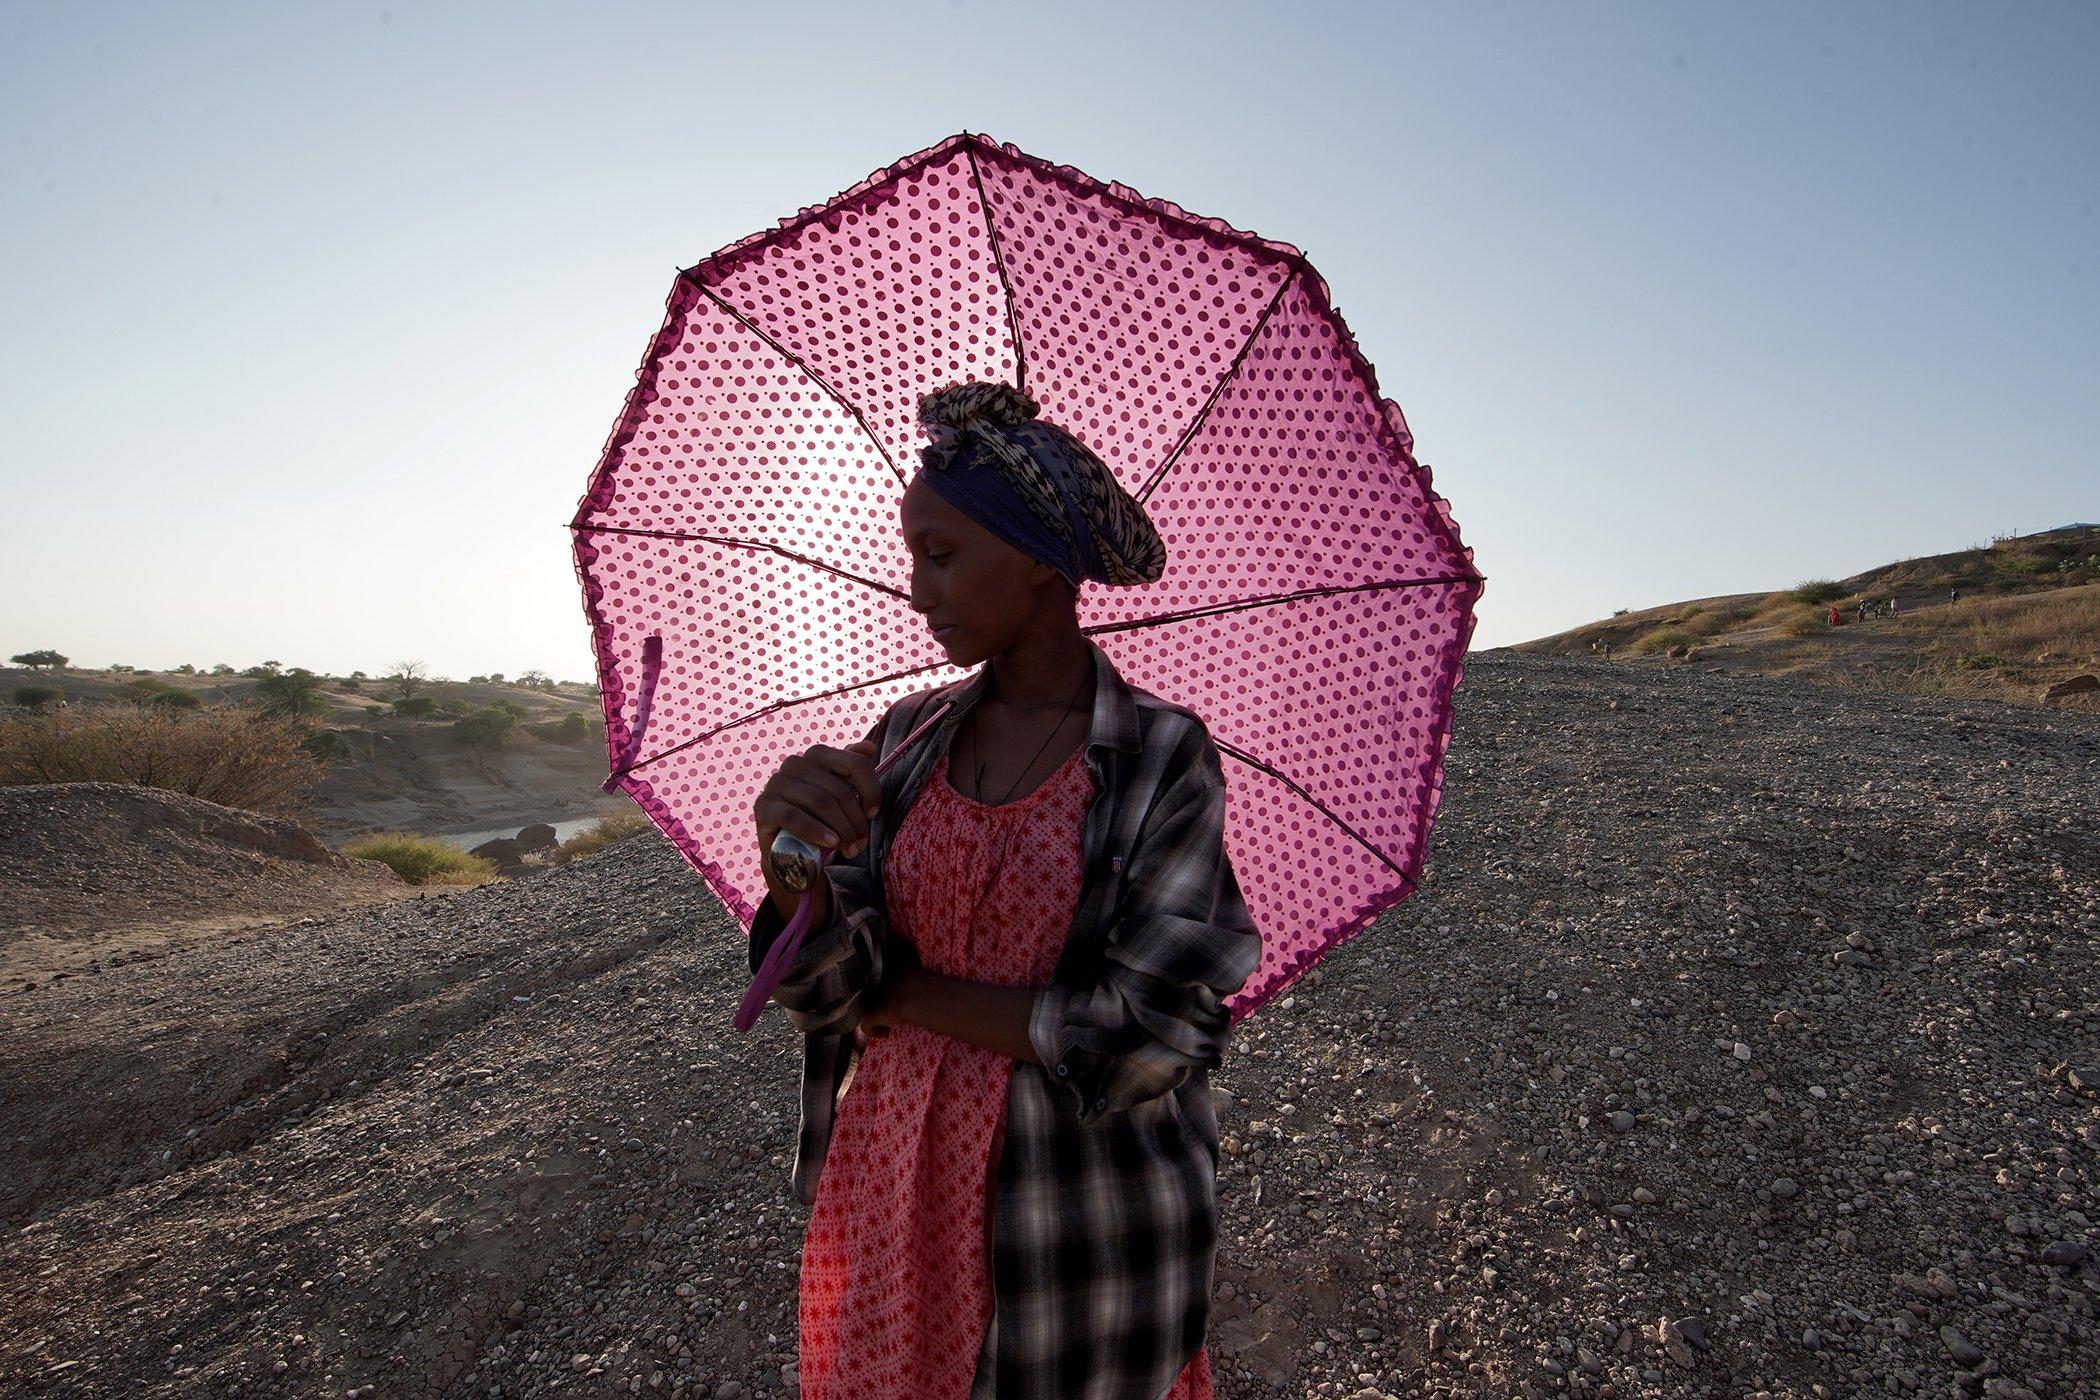 Ethiopia-Tigray-Refugees-Humanitarian-Crisis-UNHCR-002.jpg